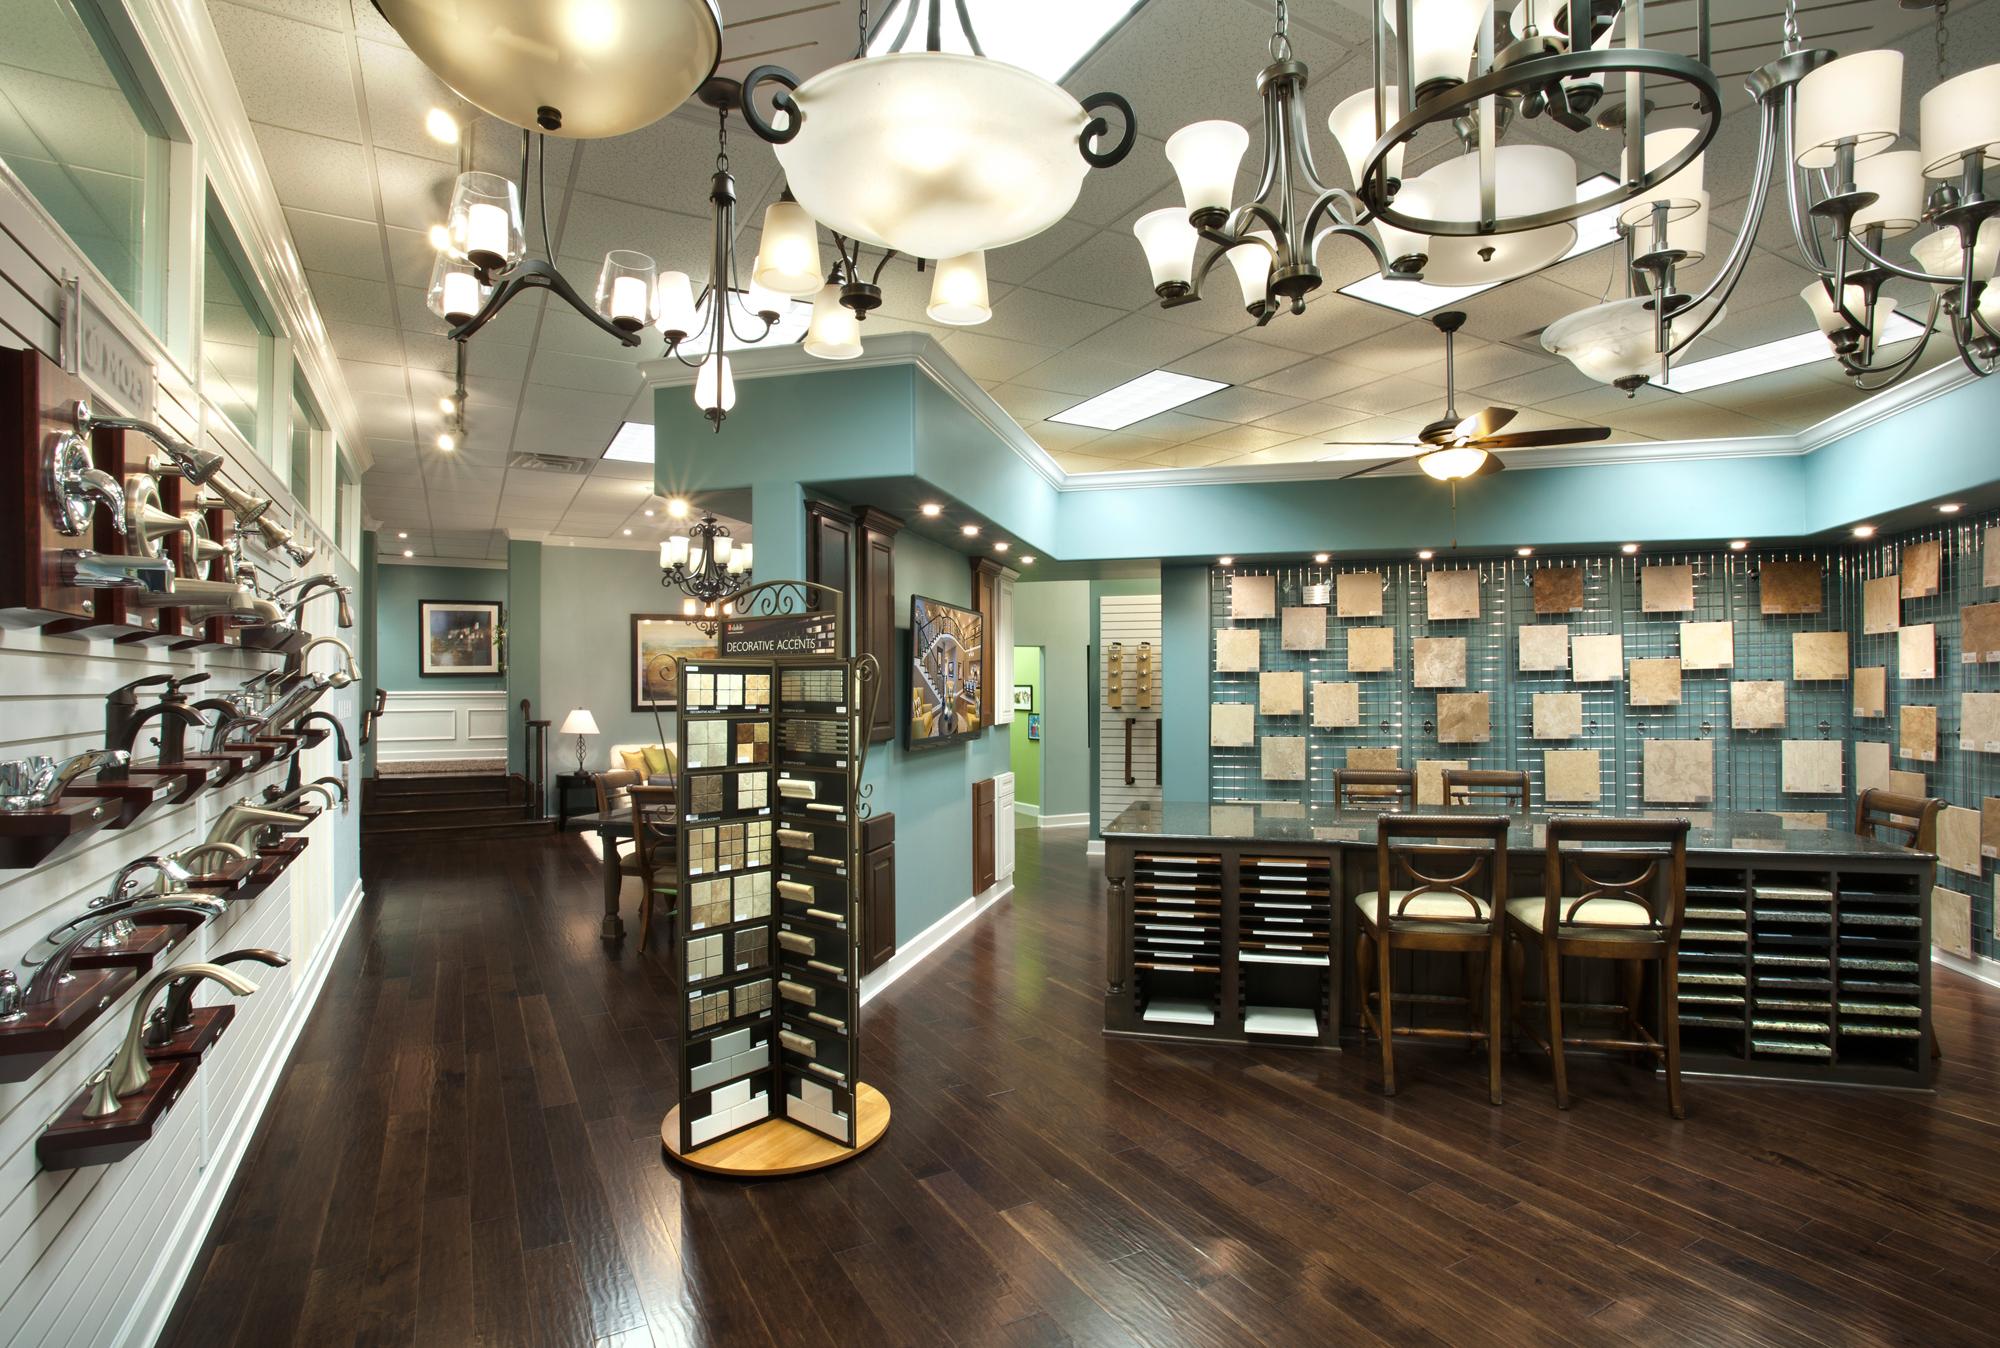 interior-commercial-photographer-texas.jpg